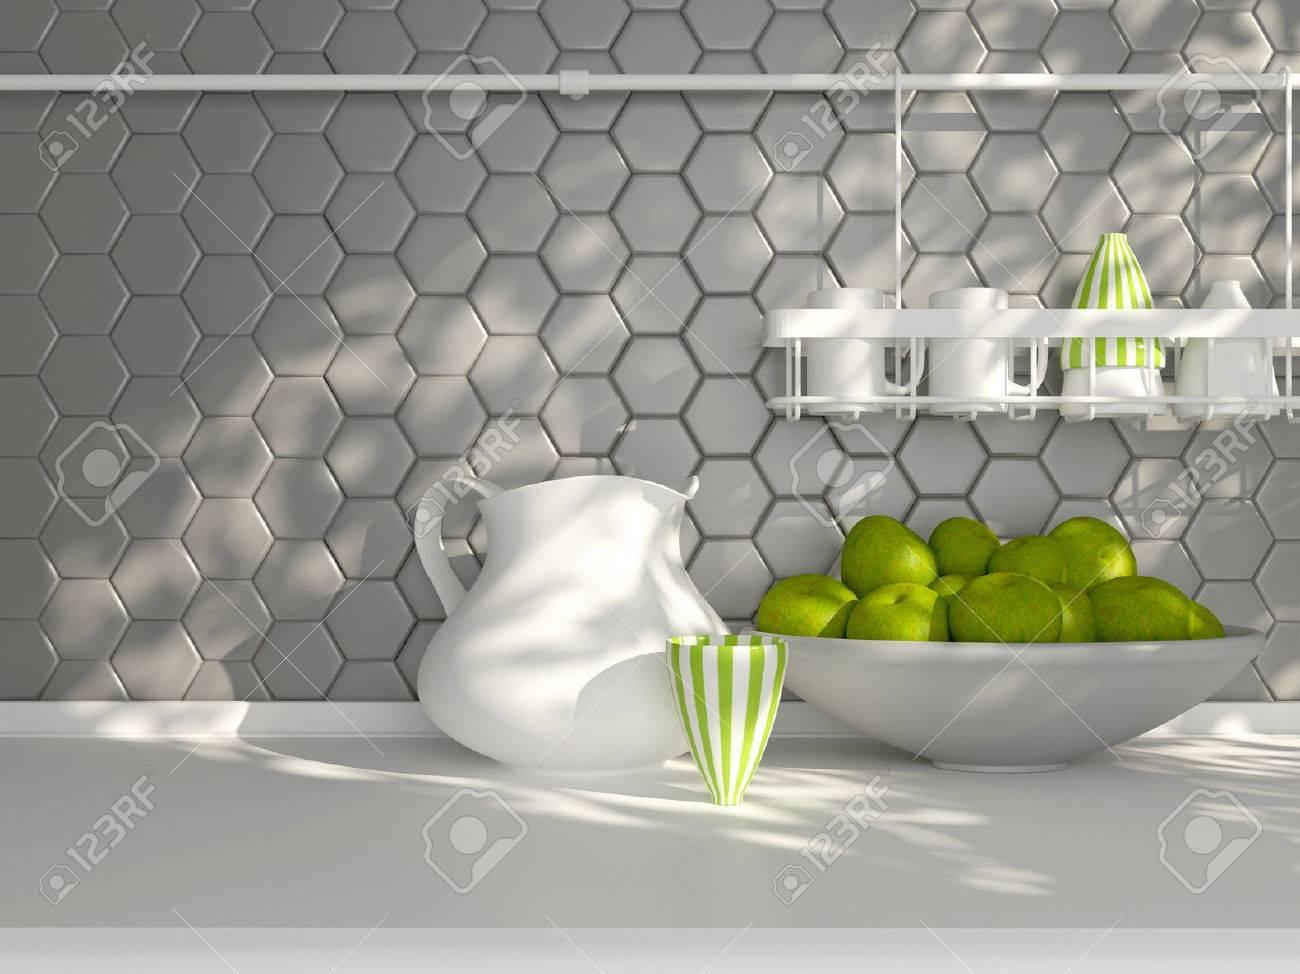 Piastrelle Da Cucina Moderne. Excellent Per Cucina Cucine Come ...